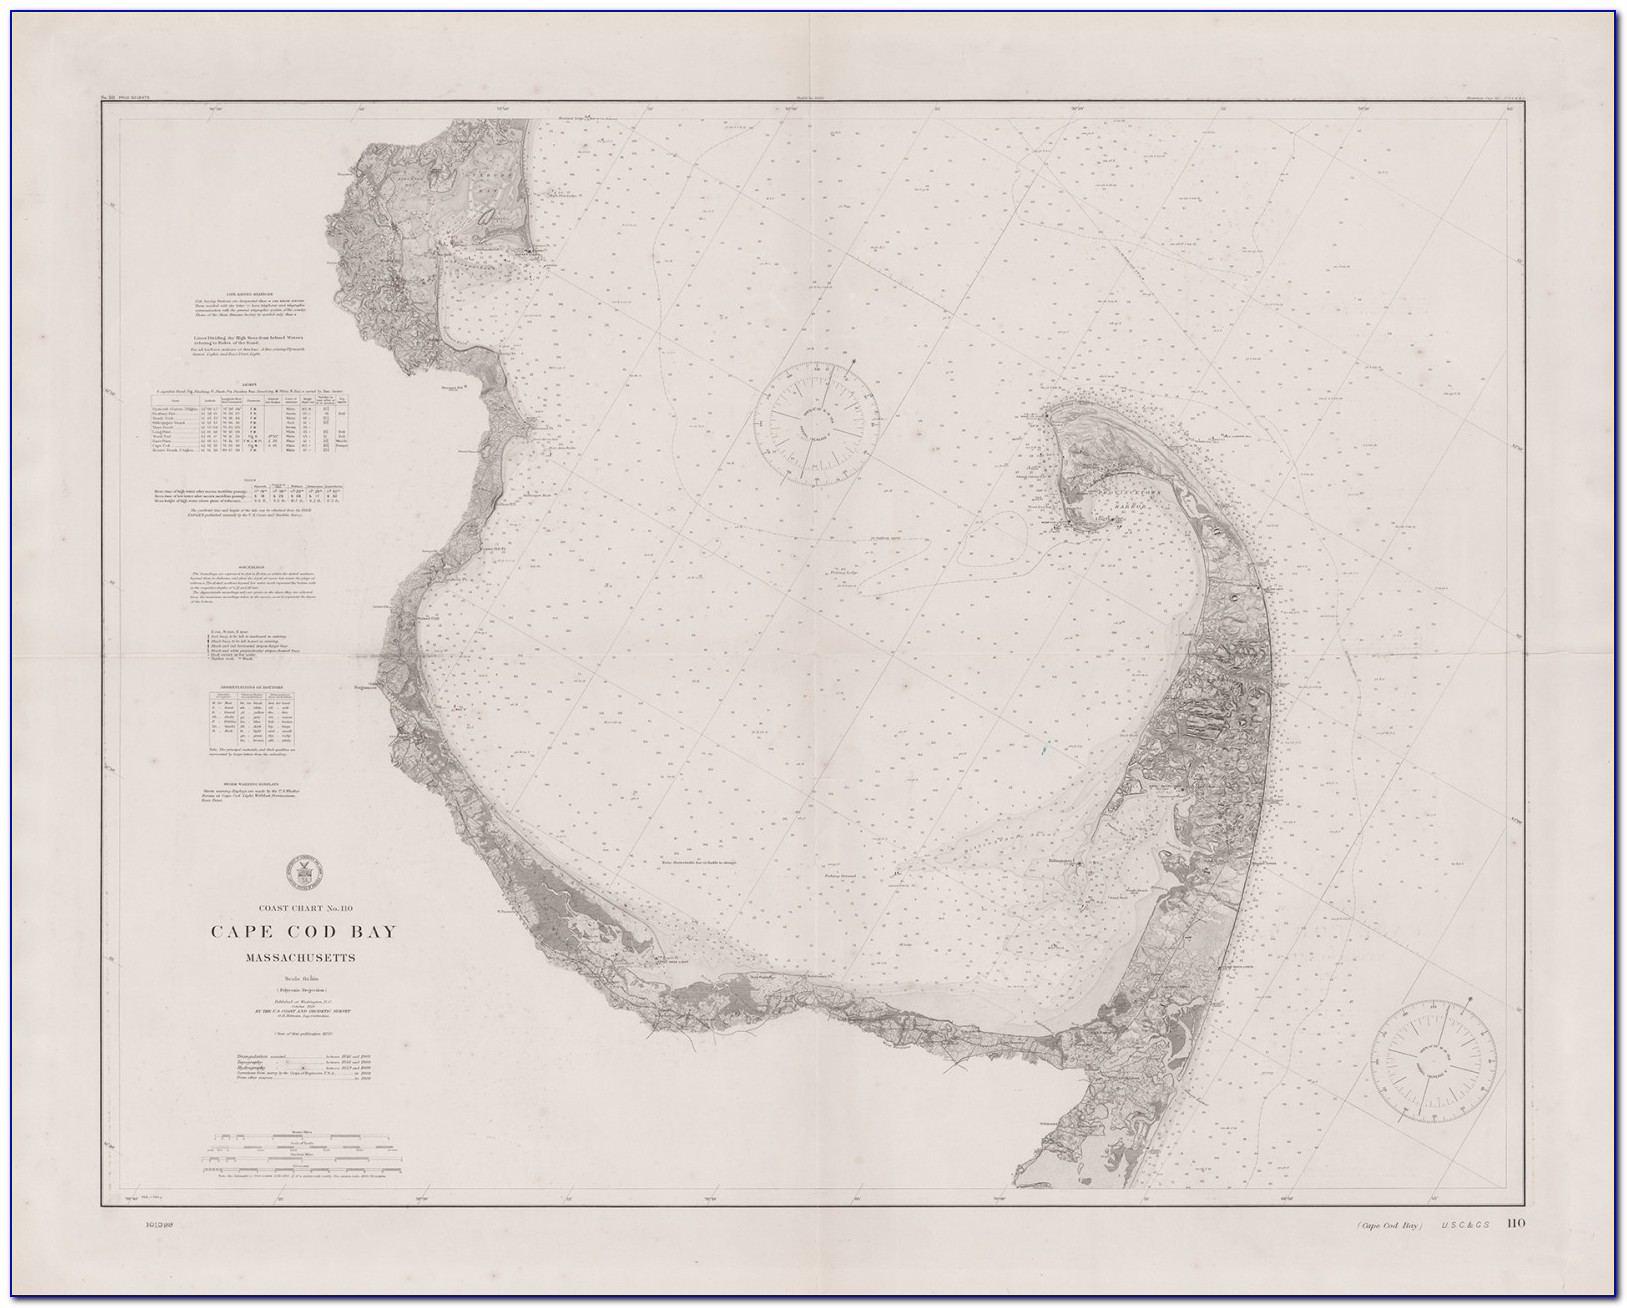 Nautical Chart Of Cape Cod Bay